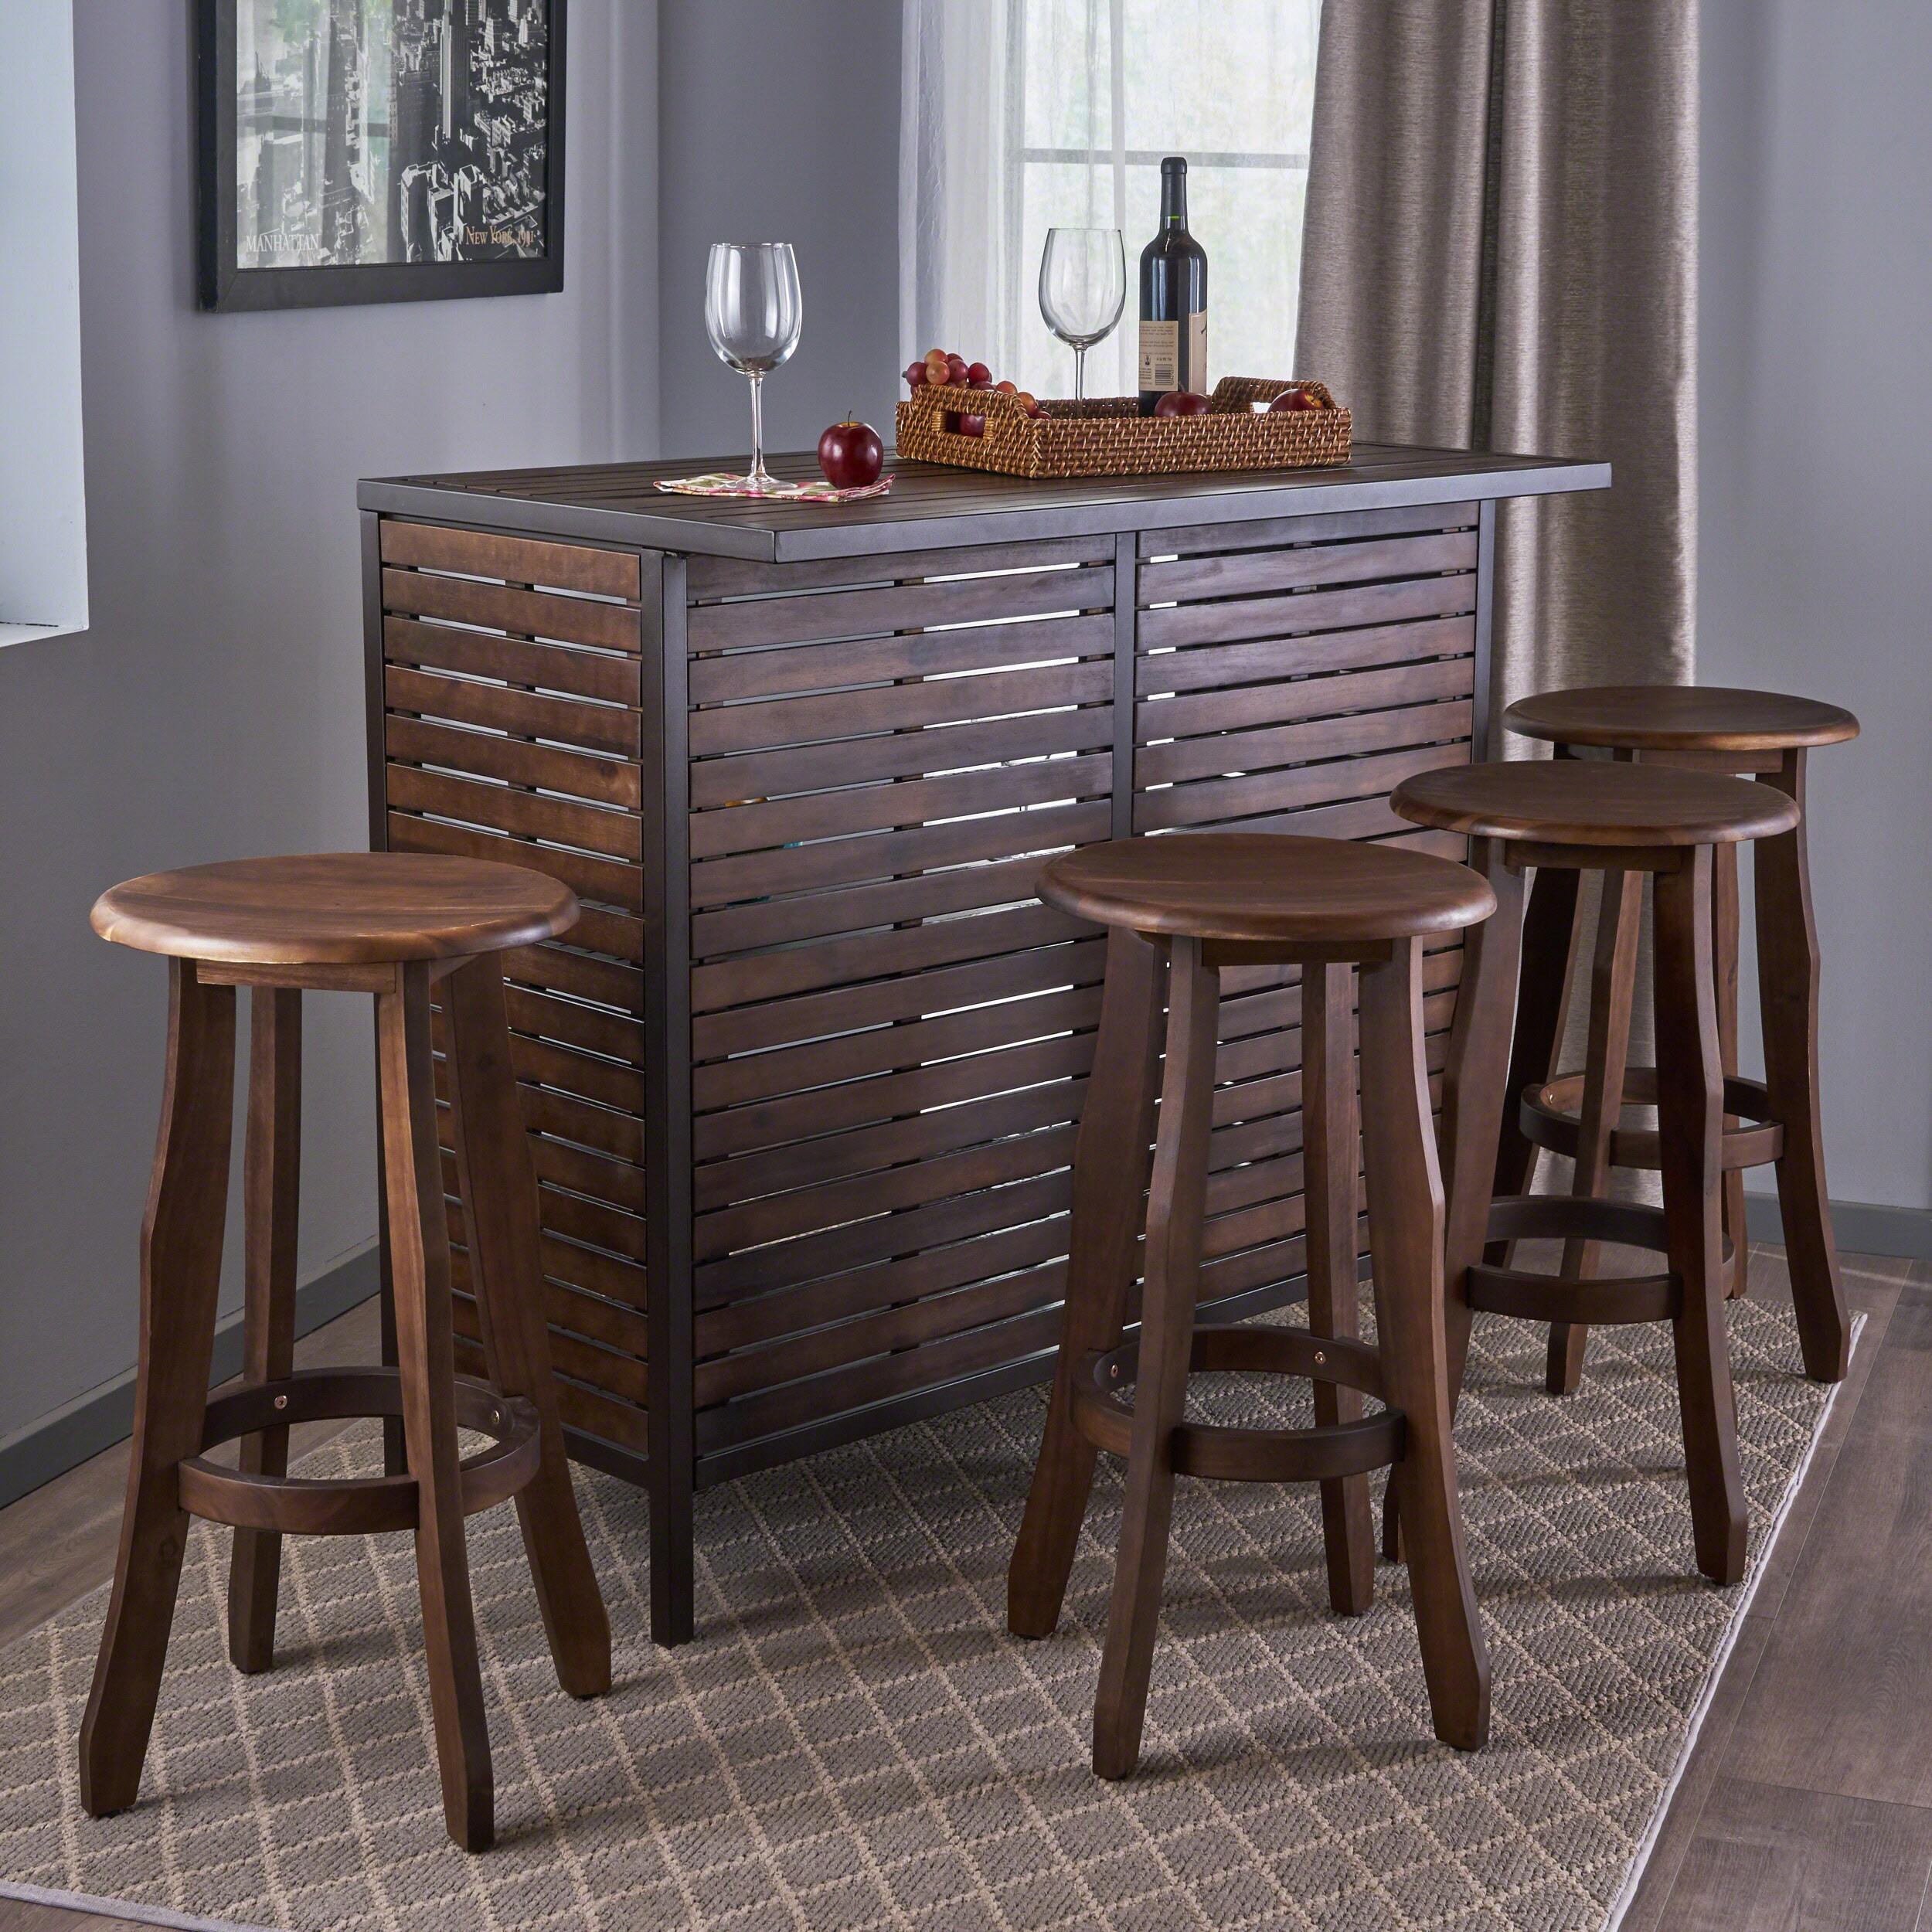 Shop Samala 5 Piece Acacia Wood Bar Set